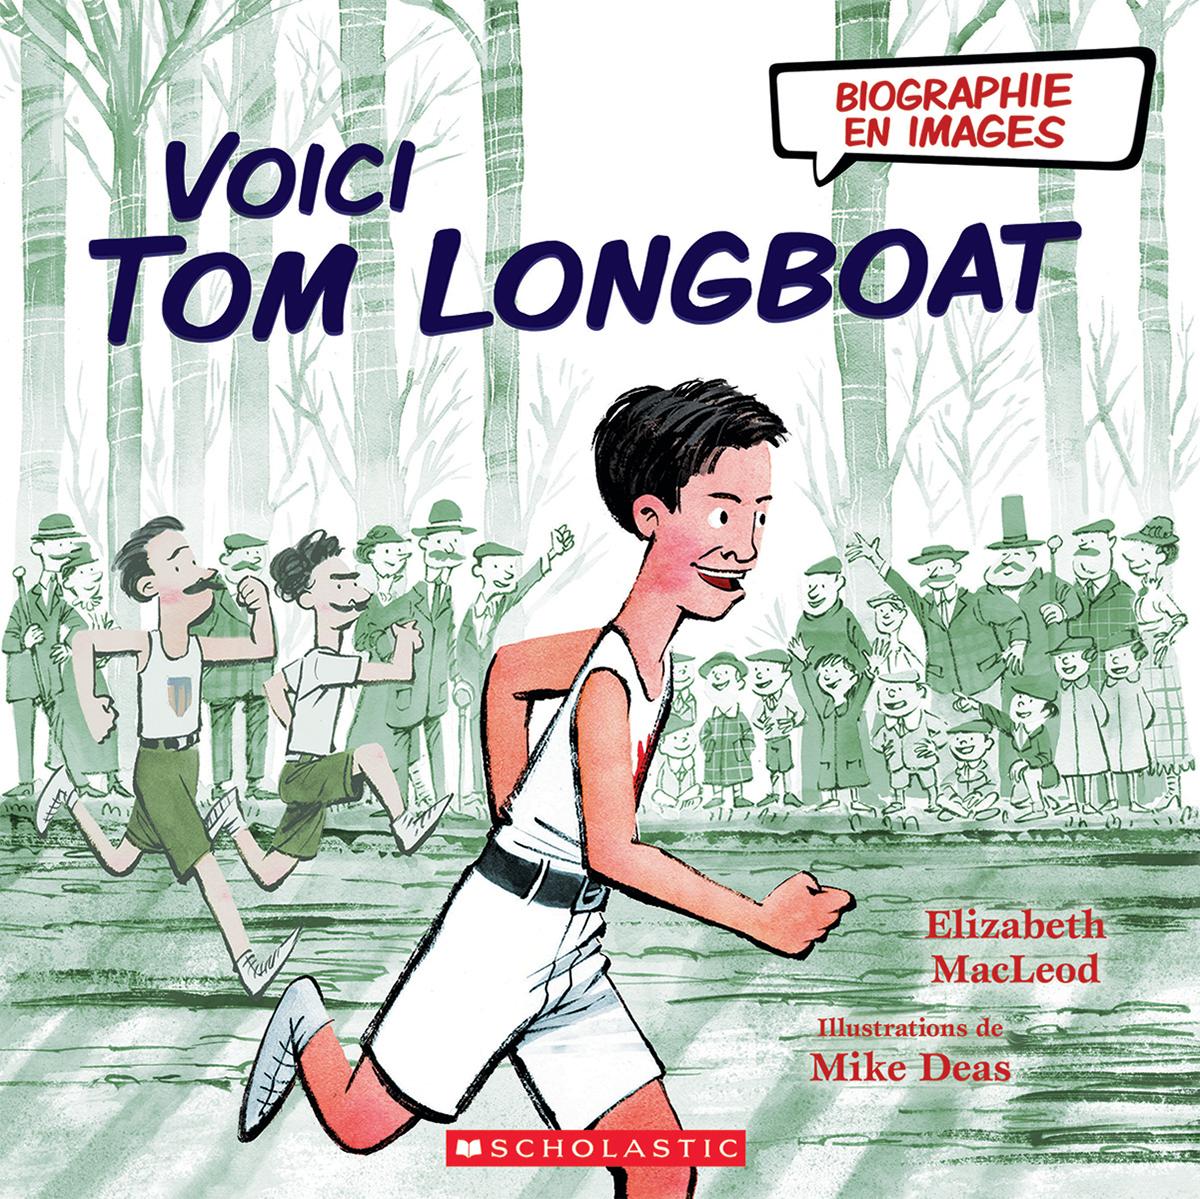 Biographie en images : Voici Tom Longboat